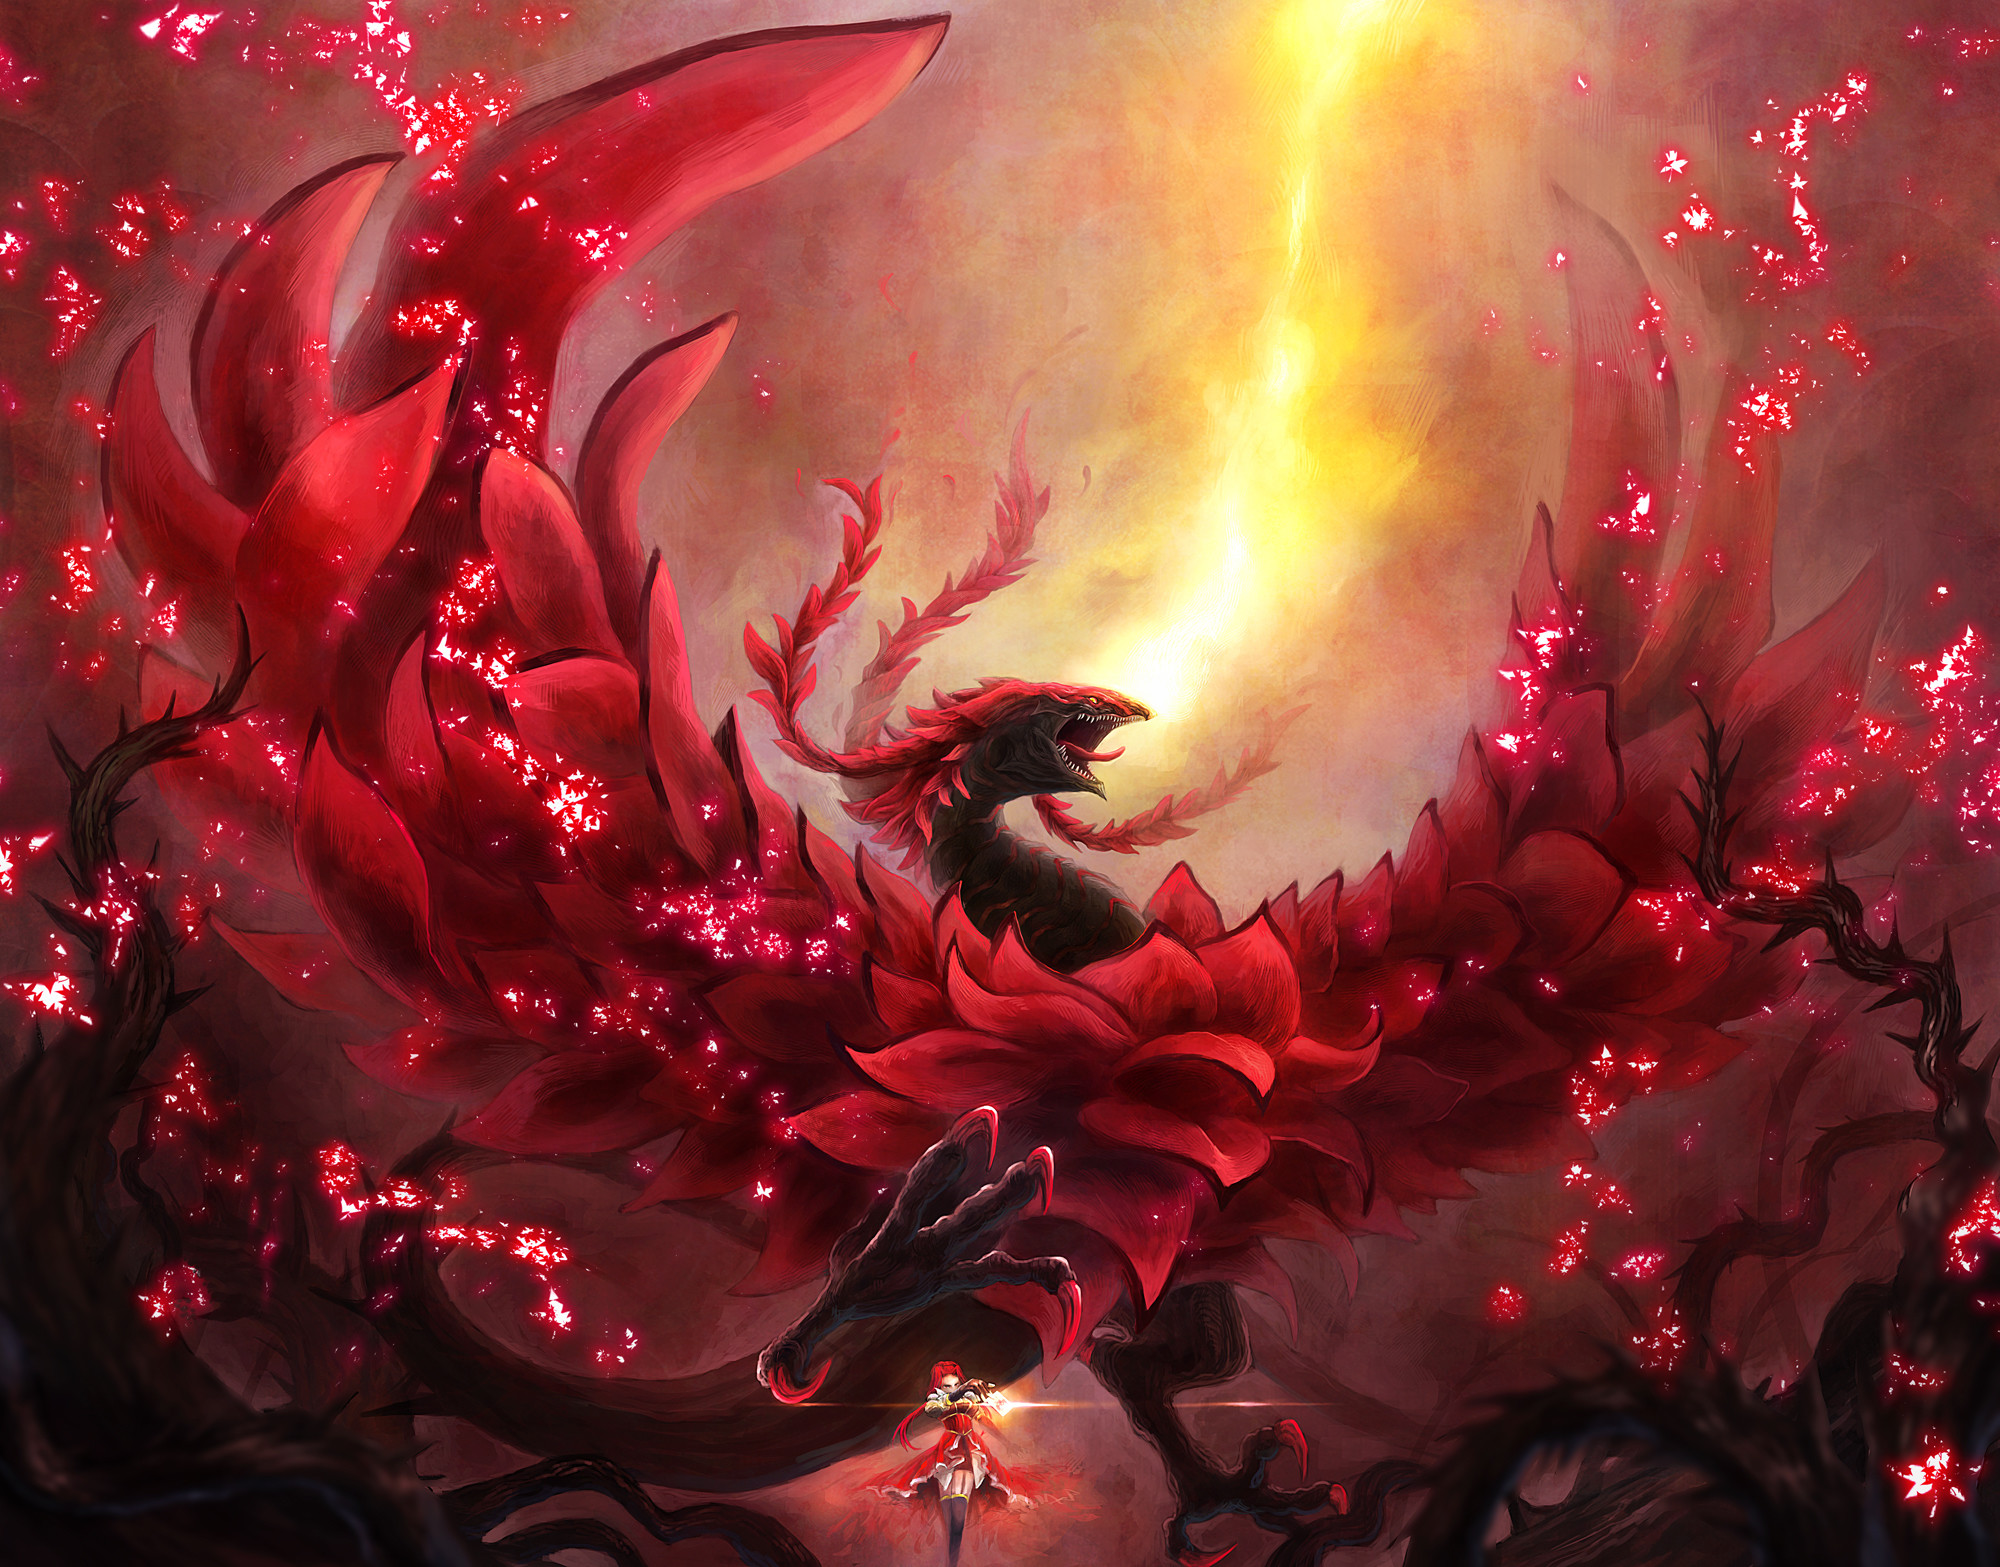 Black Rose Dragon Wallpaper ·① WallpaperTag